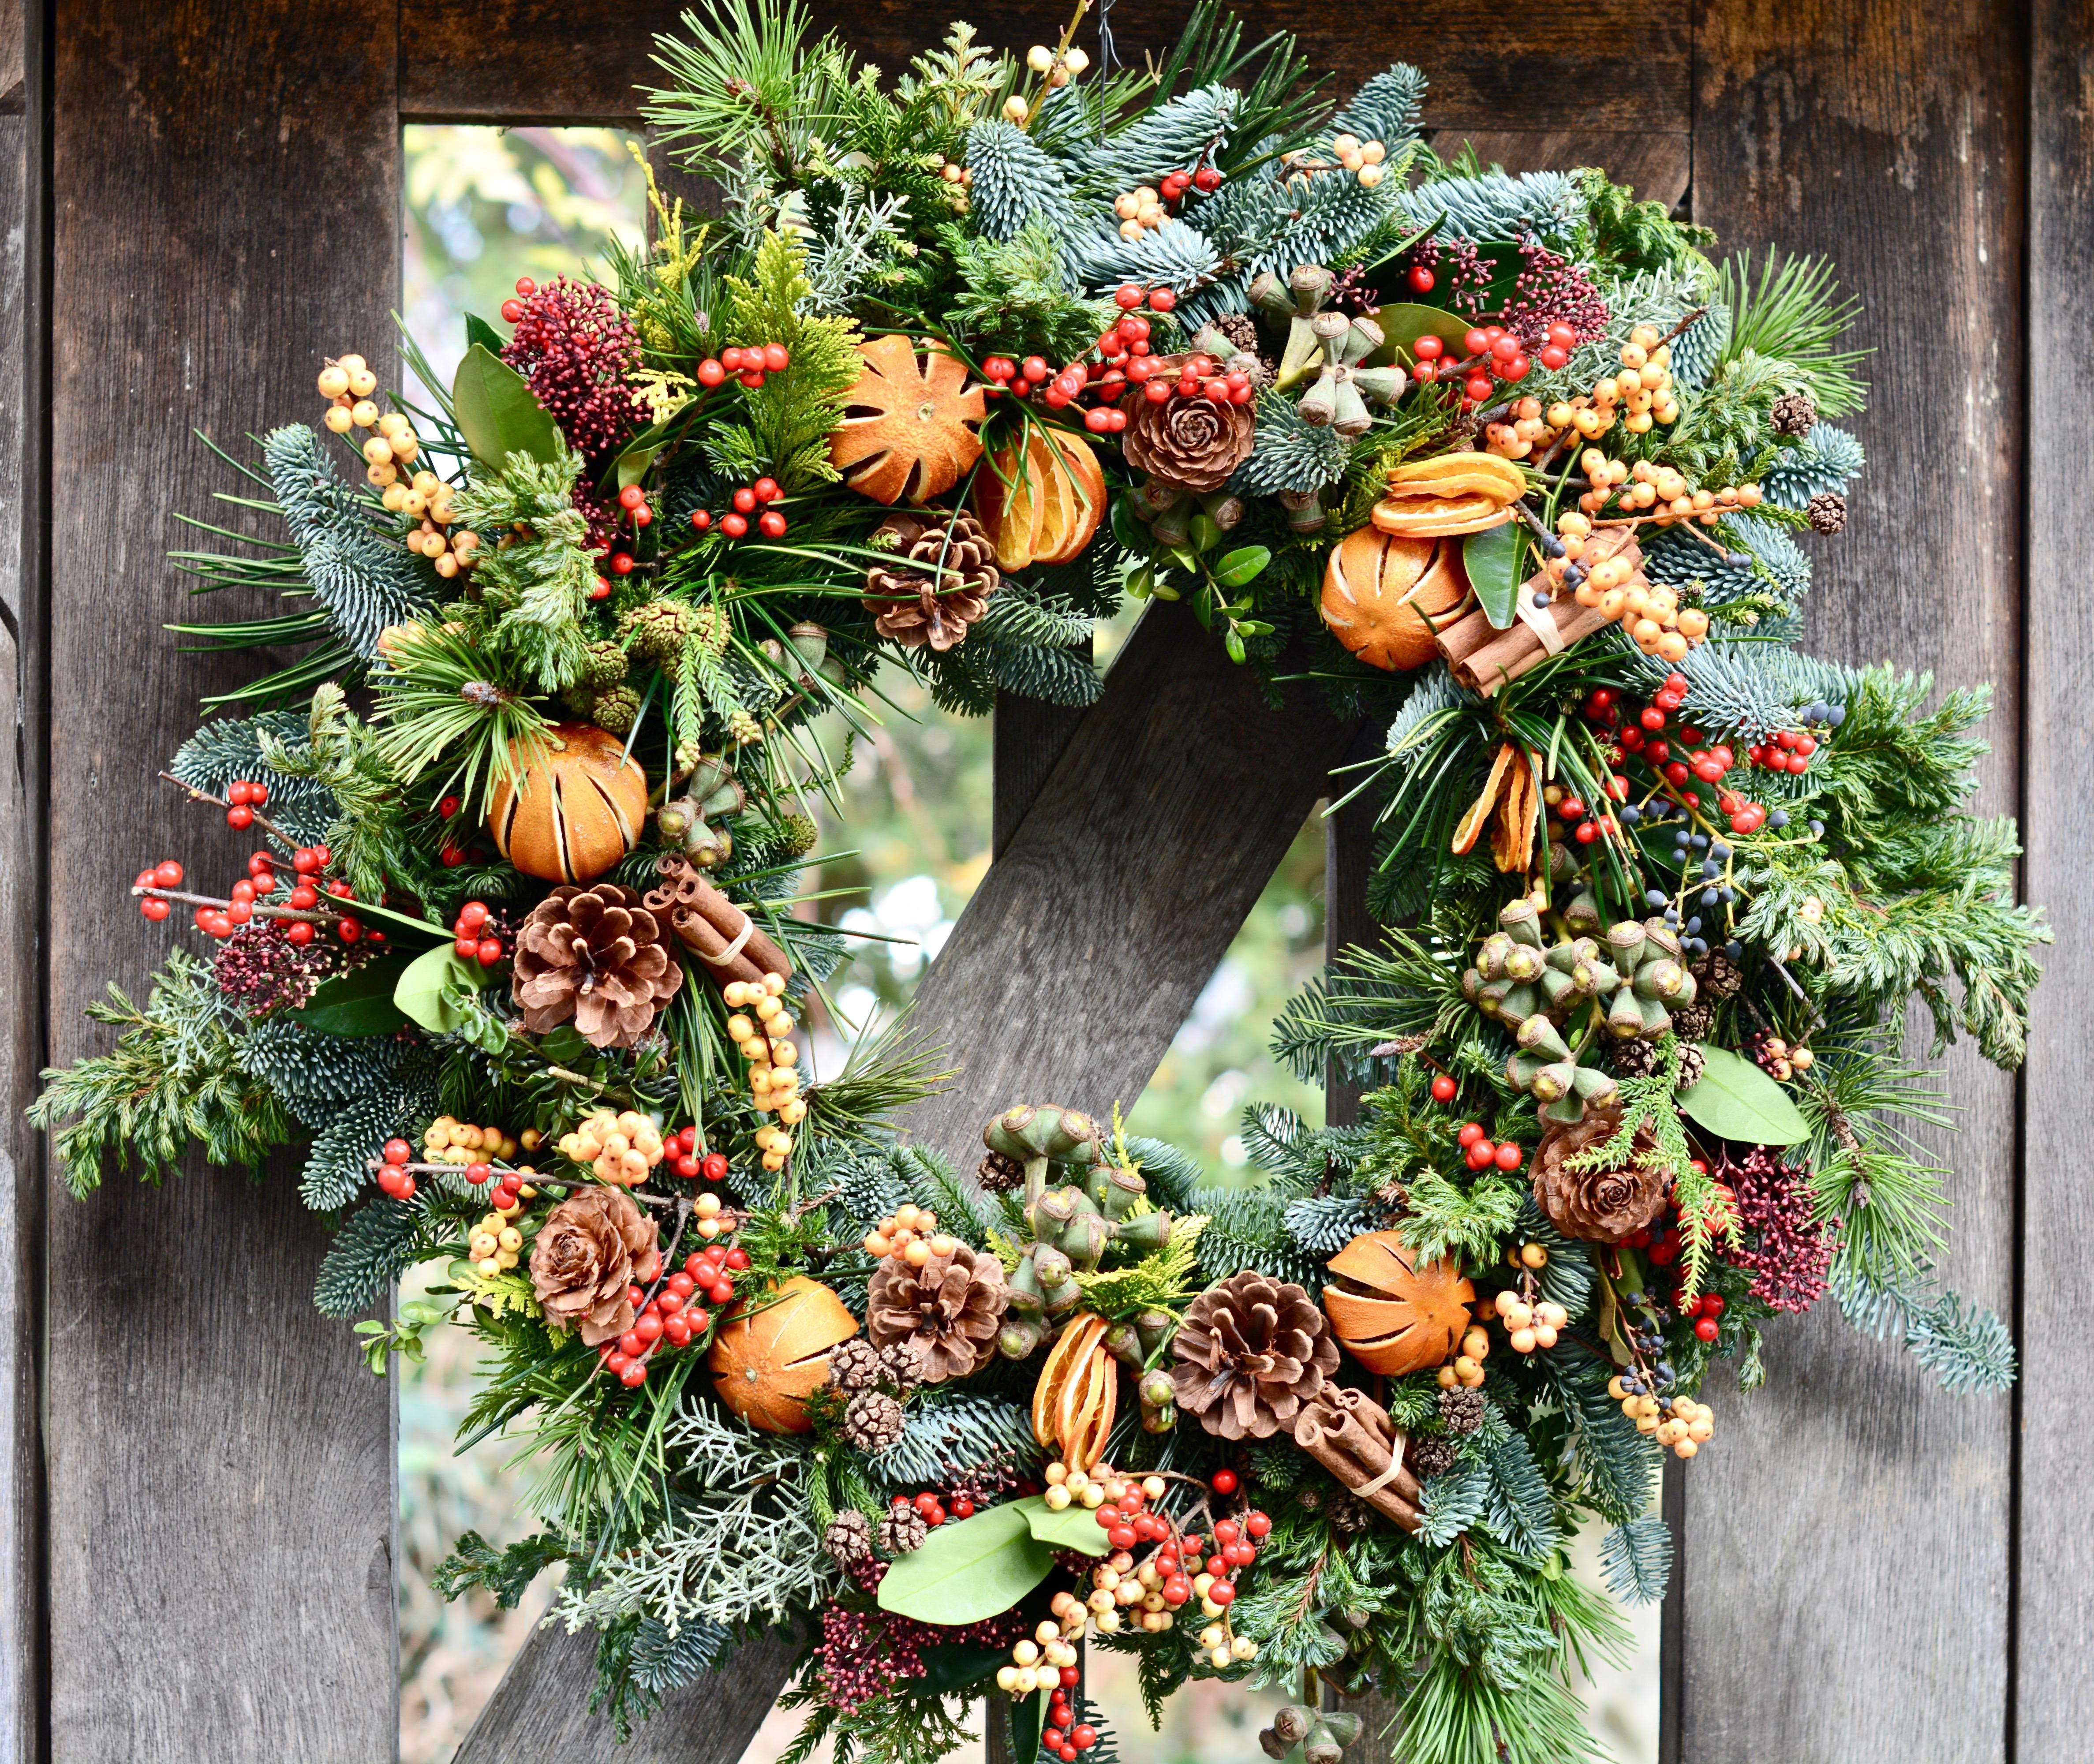 Festive Fruit Wreath